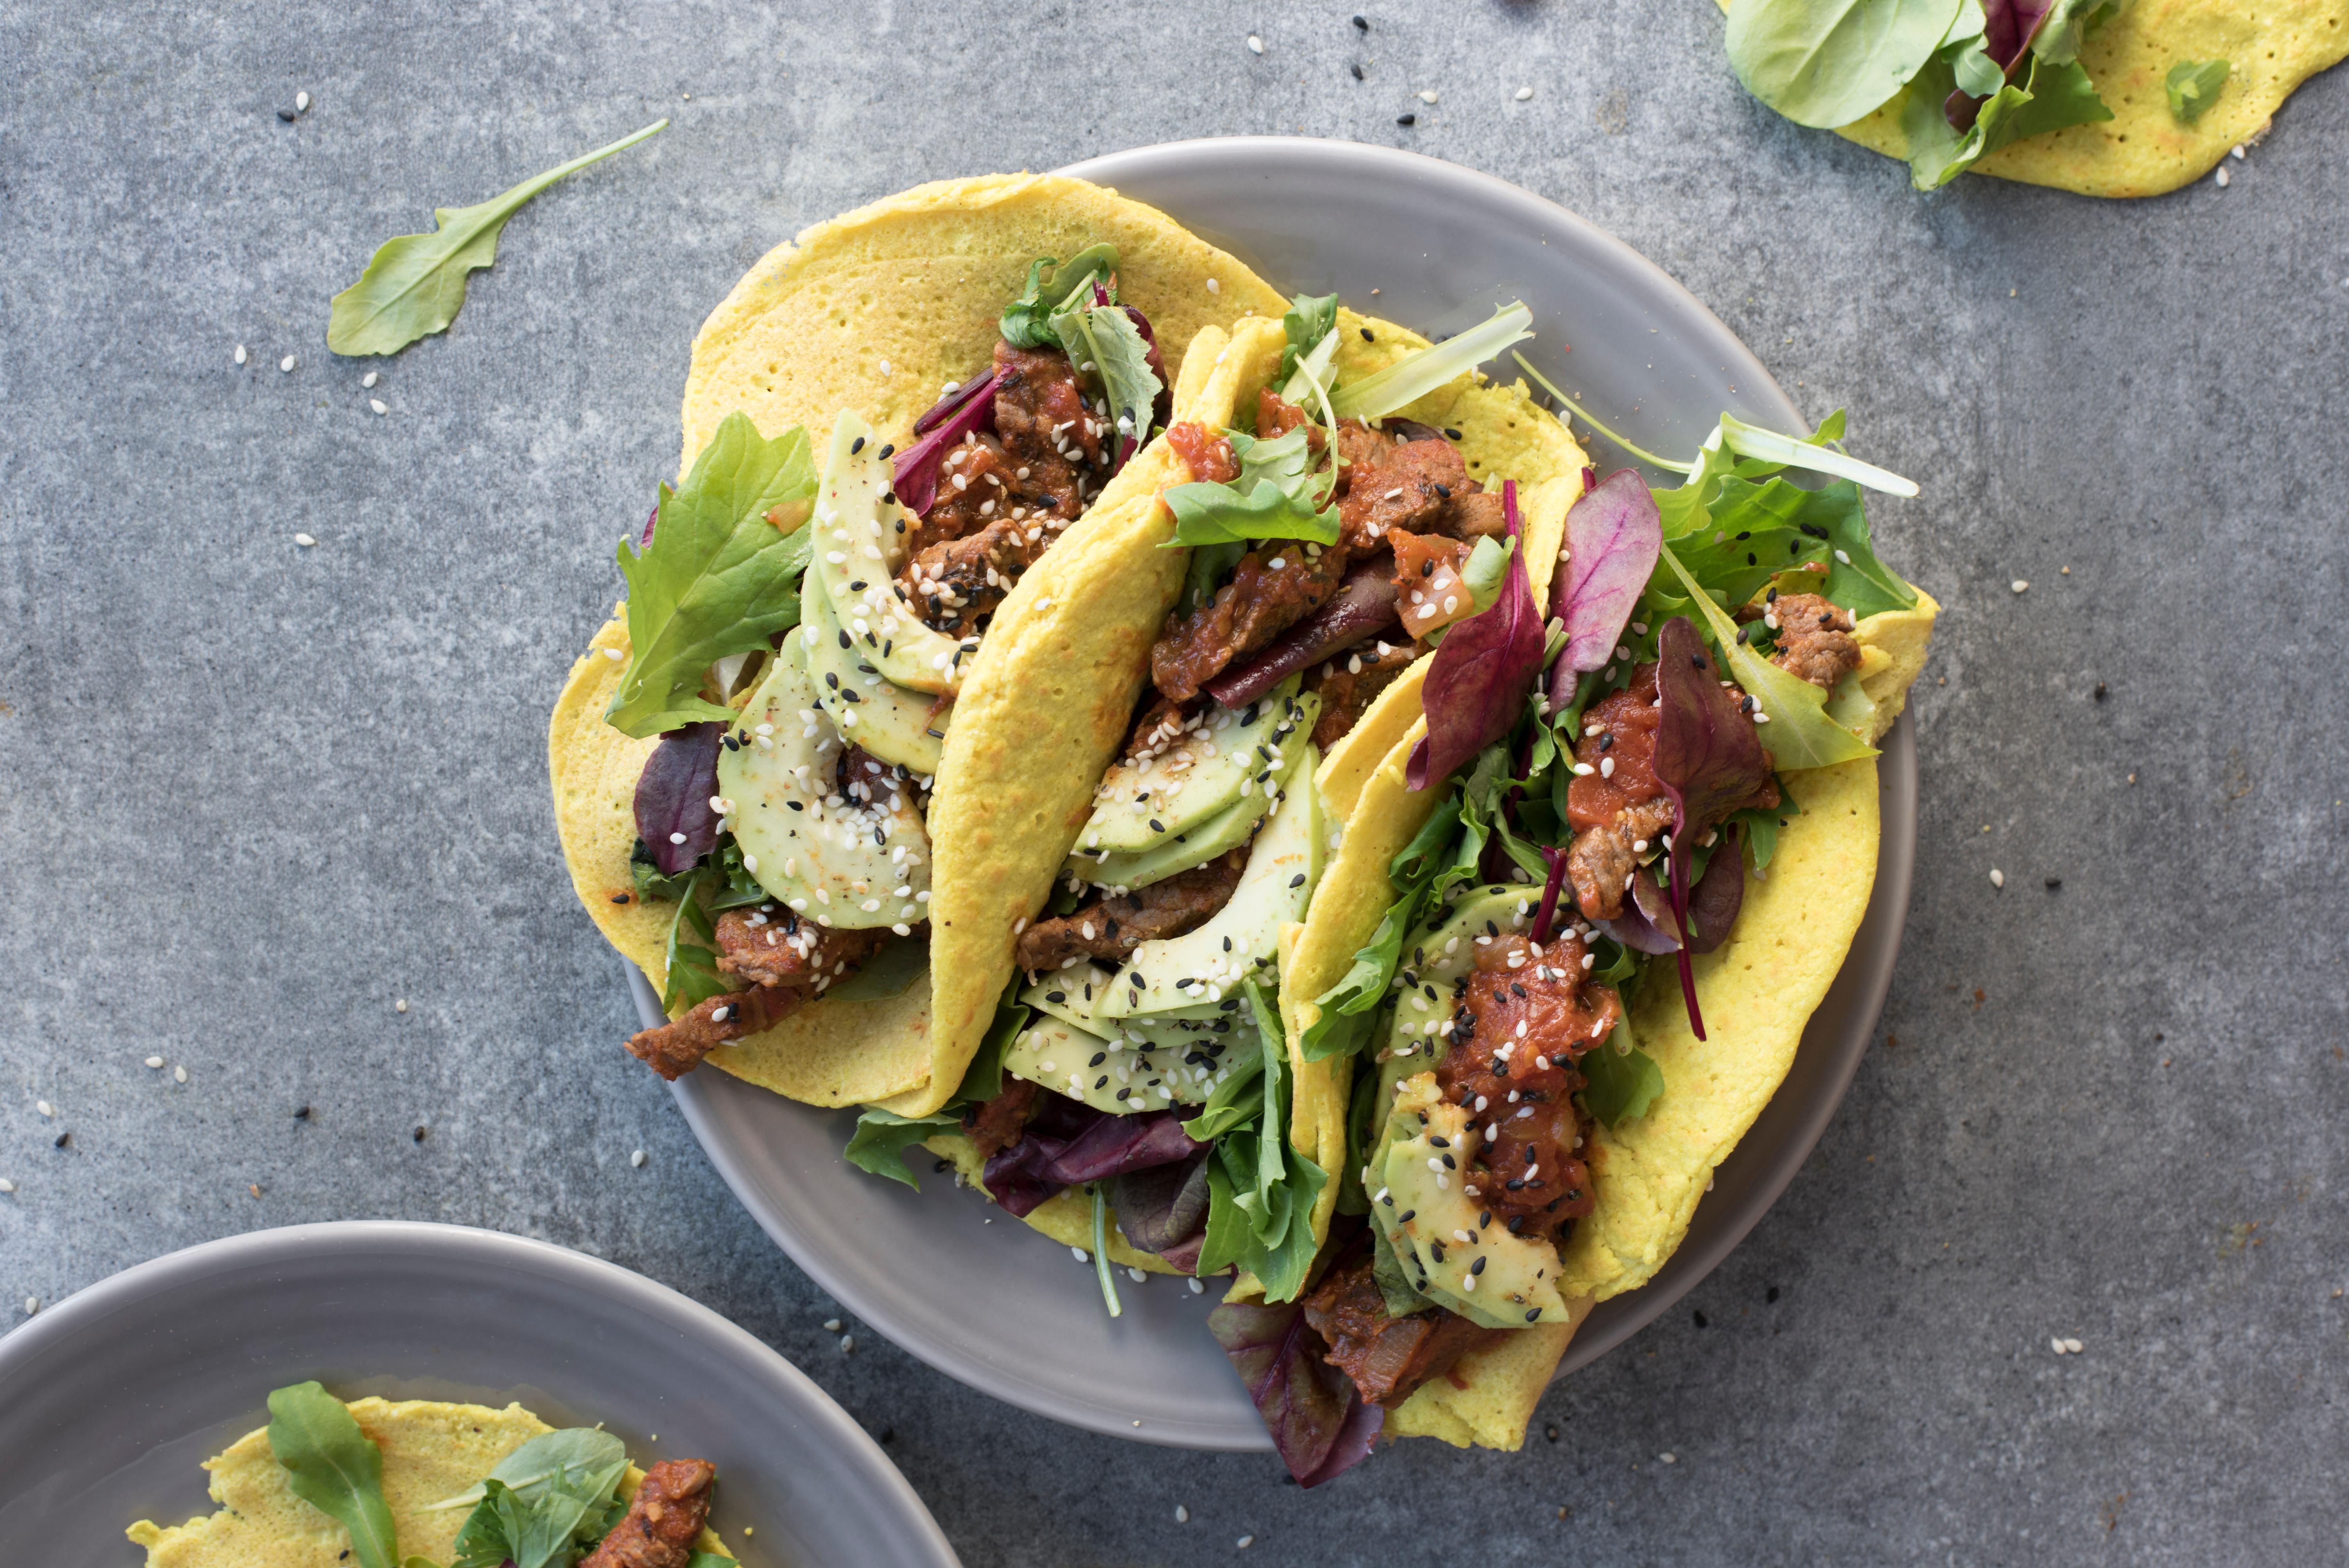 Taco met pittige kipsalade en avocado